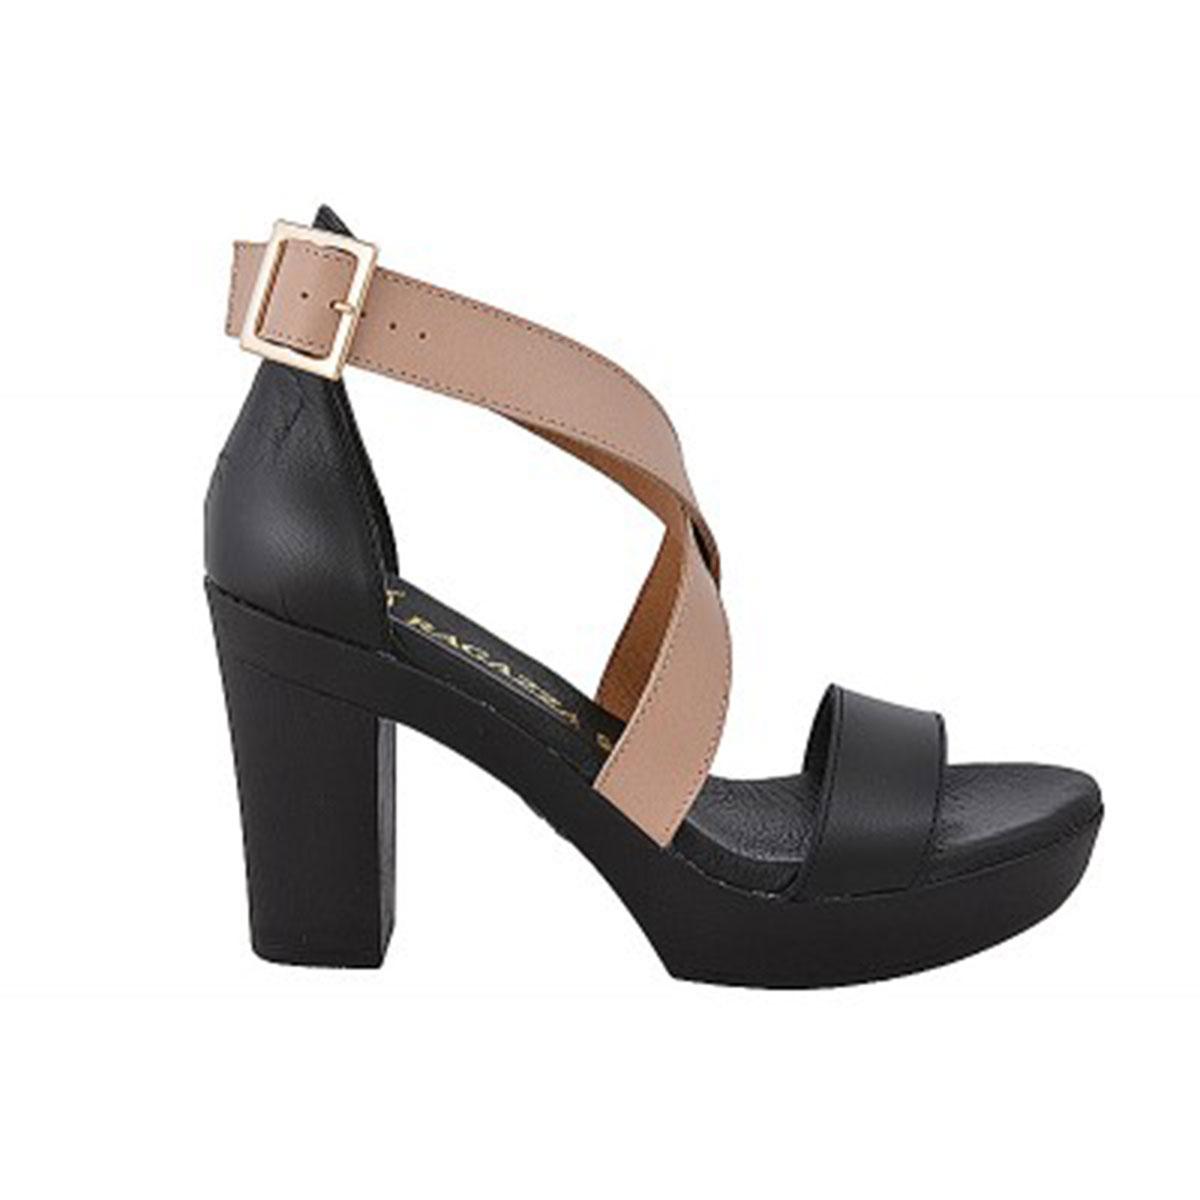 39a92f3e59 RAGAZZA 0340 Γυναικεία Πέδιλα Δέρμα Μαύρο – ILoveMyShoes